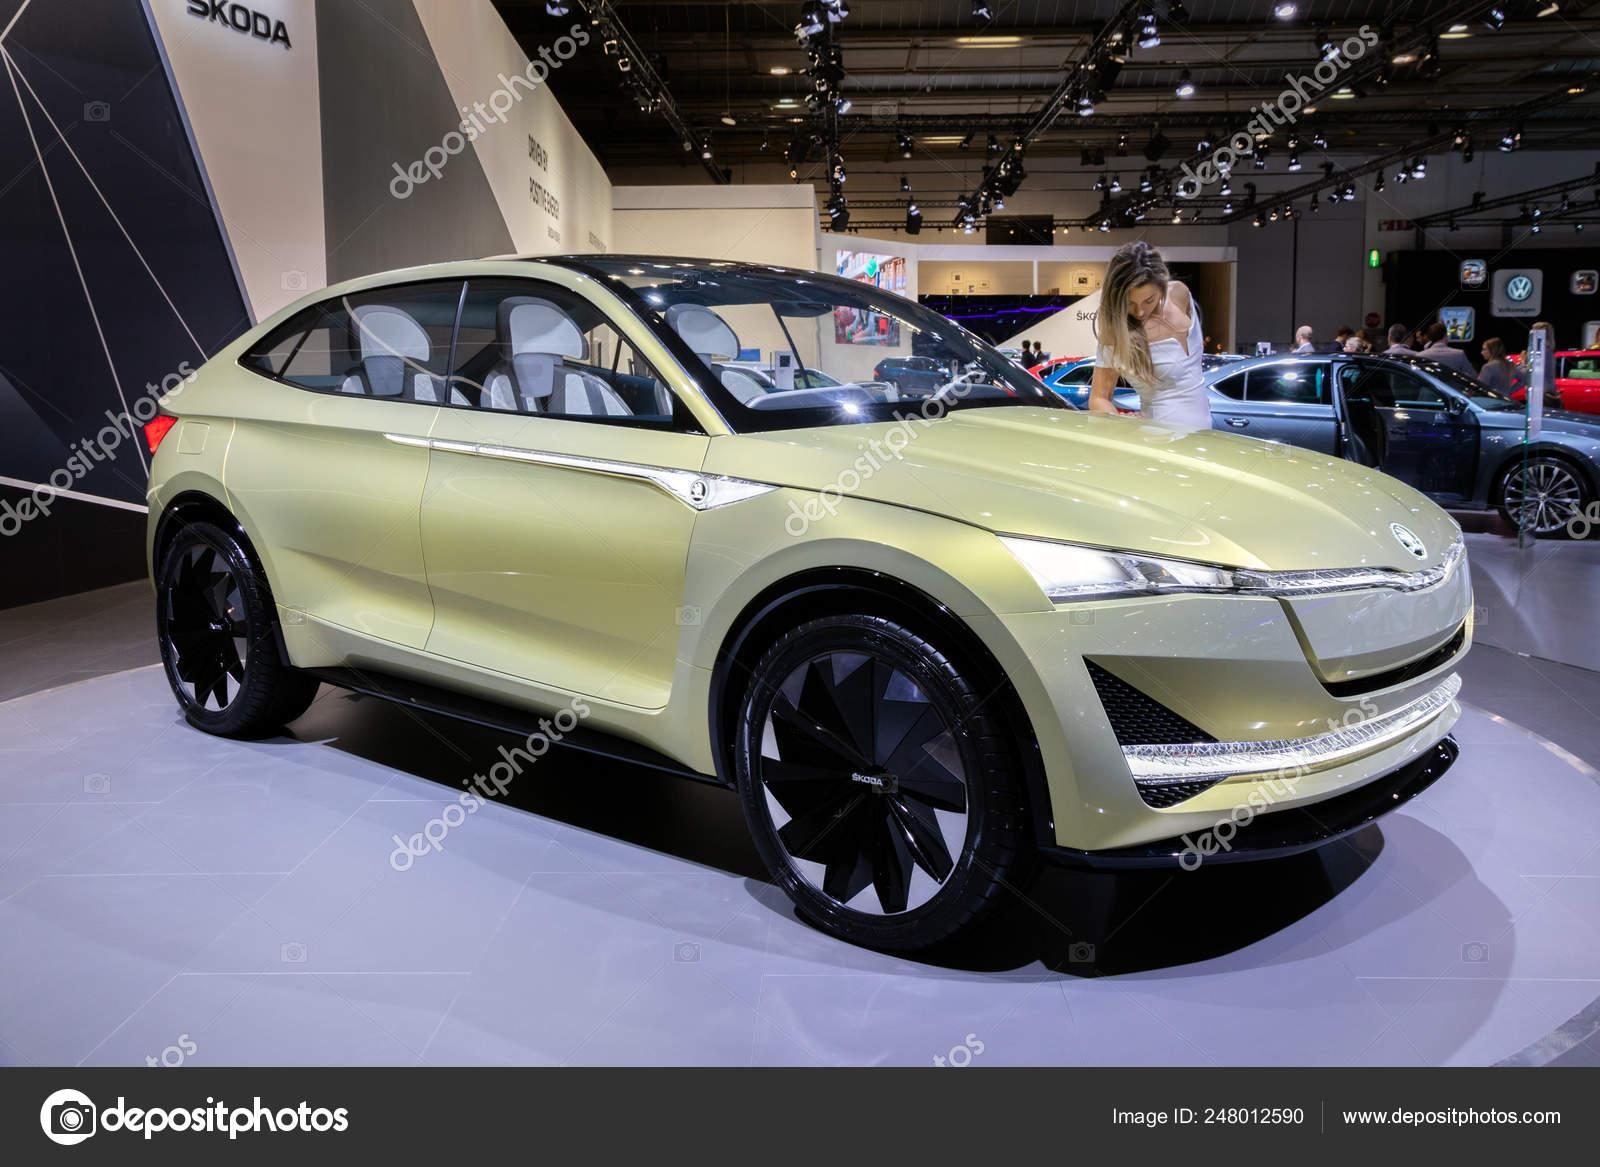 Skoda Vision E Electric Car Stock Editorial Photo C Foto Vdw 248012590